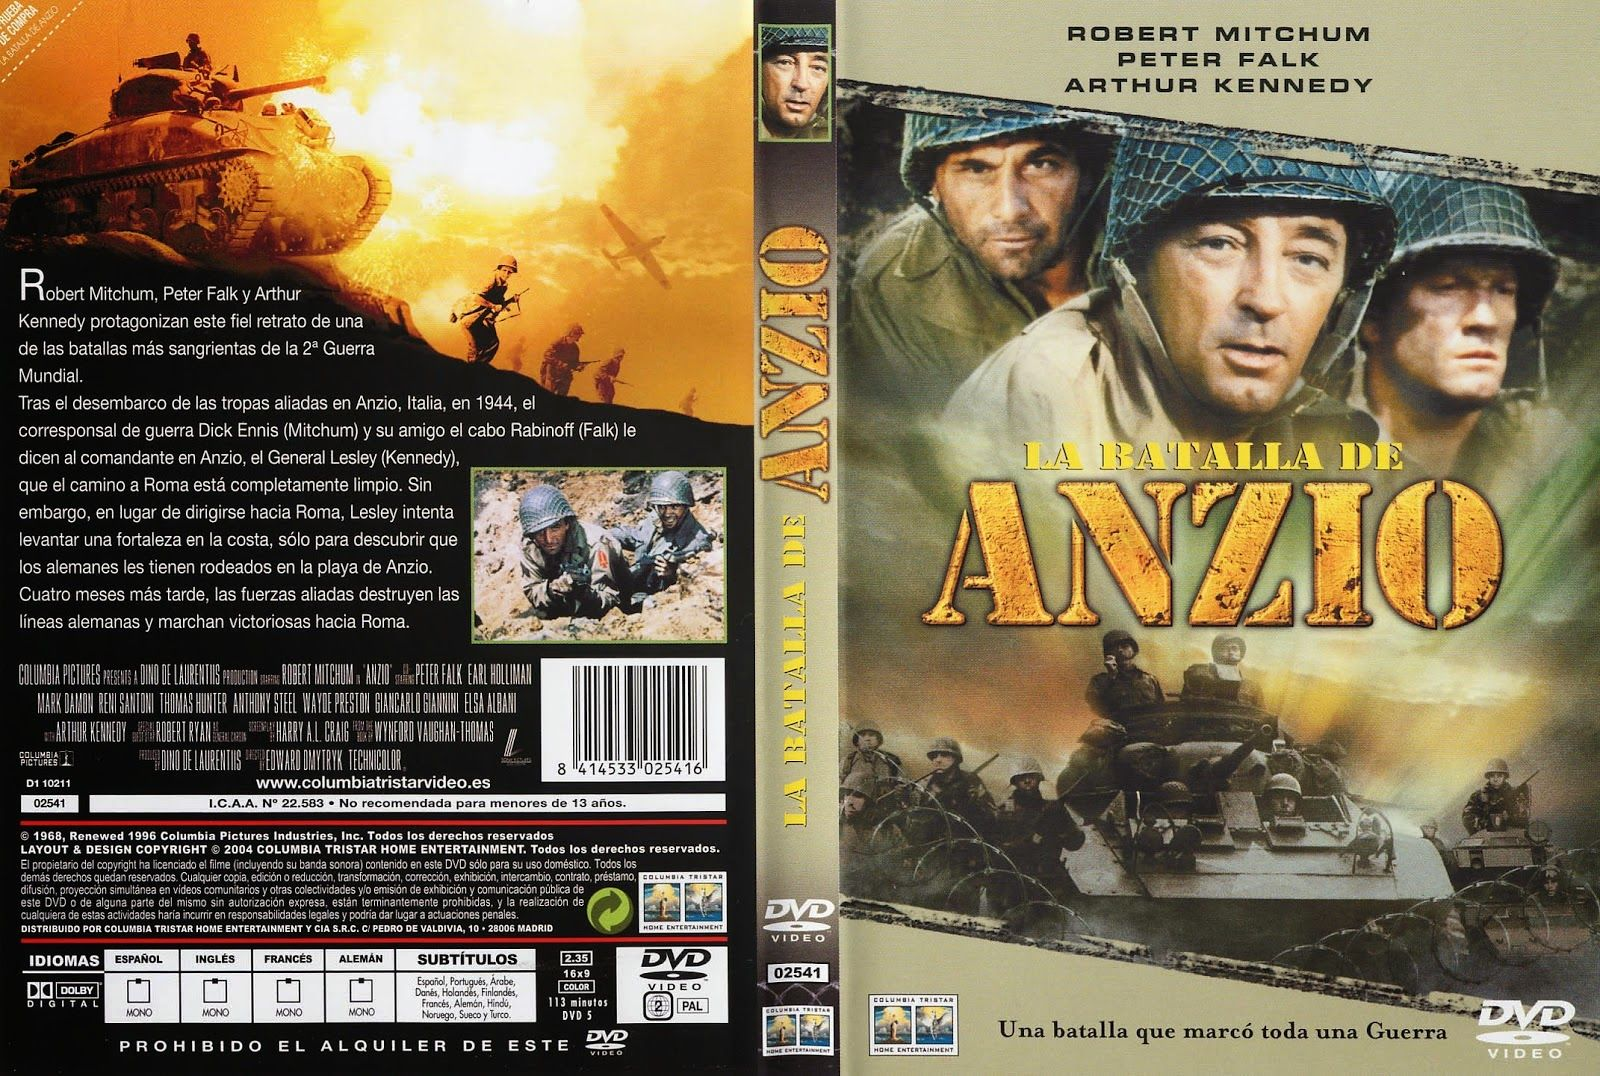 Carátula dvd: La batalla de Anzio (1968) (Lo sbarco di Anzio)